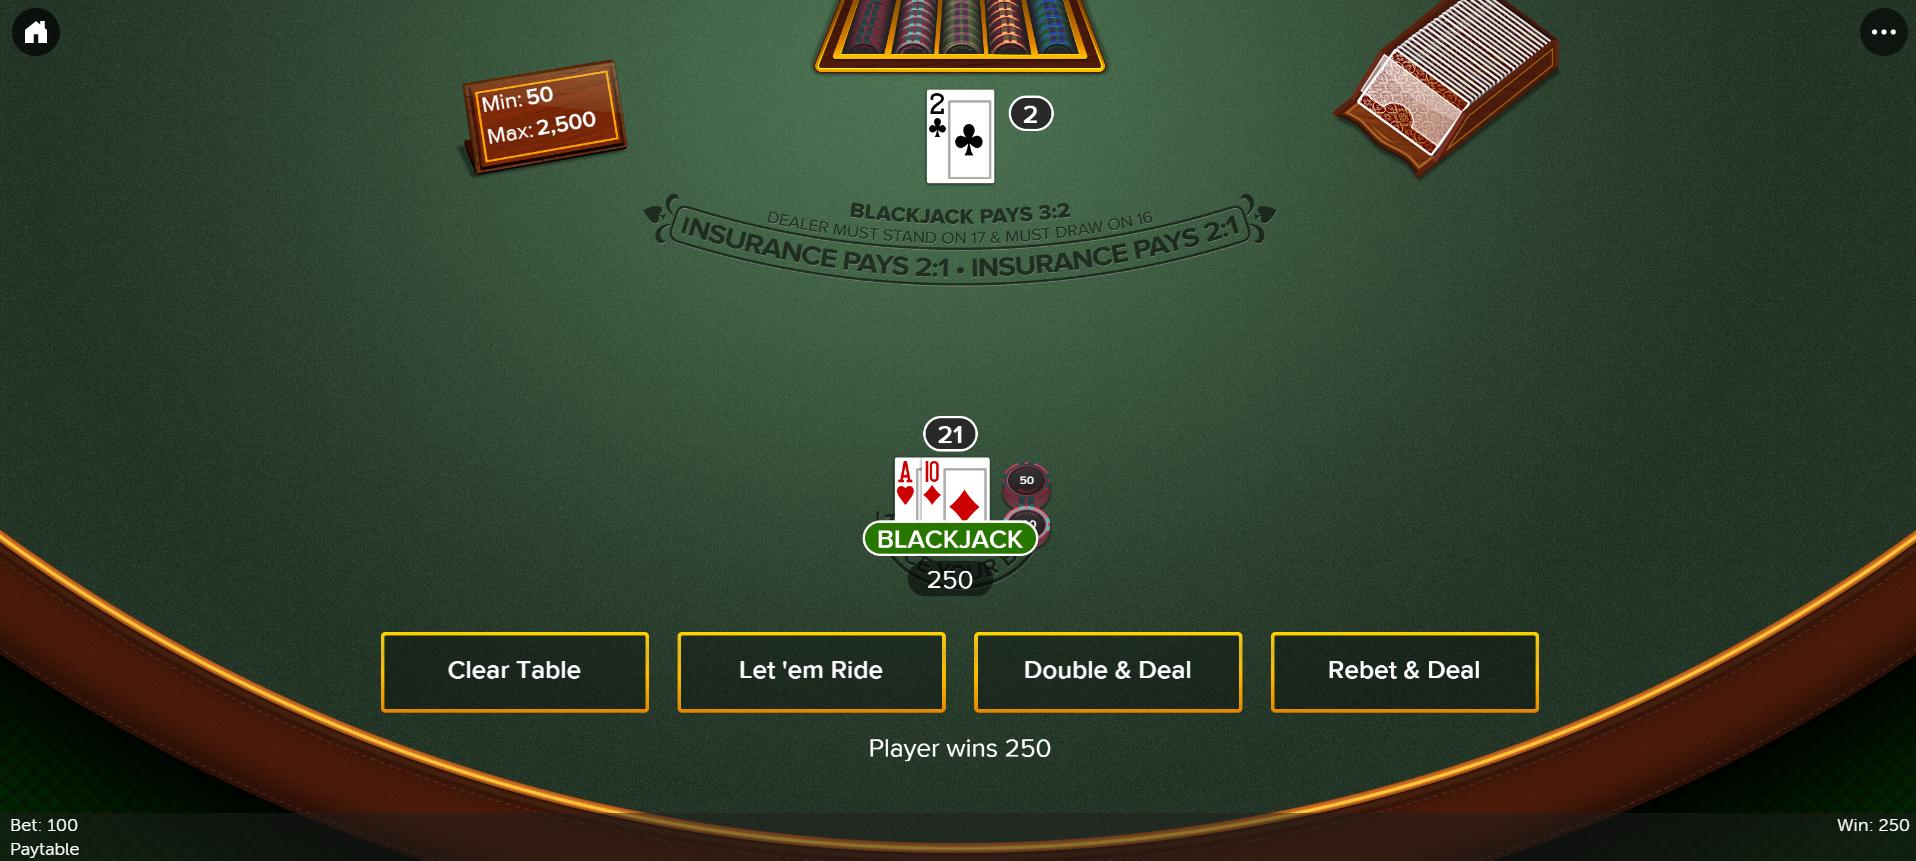 Virgin NJ Online Blackjack